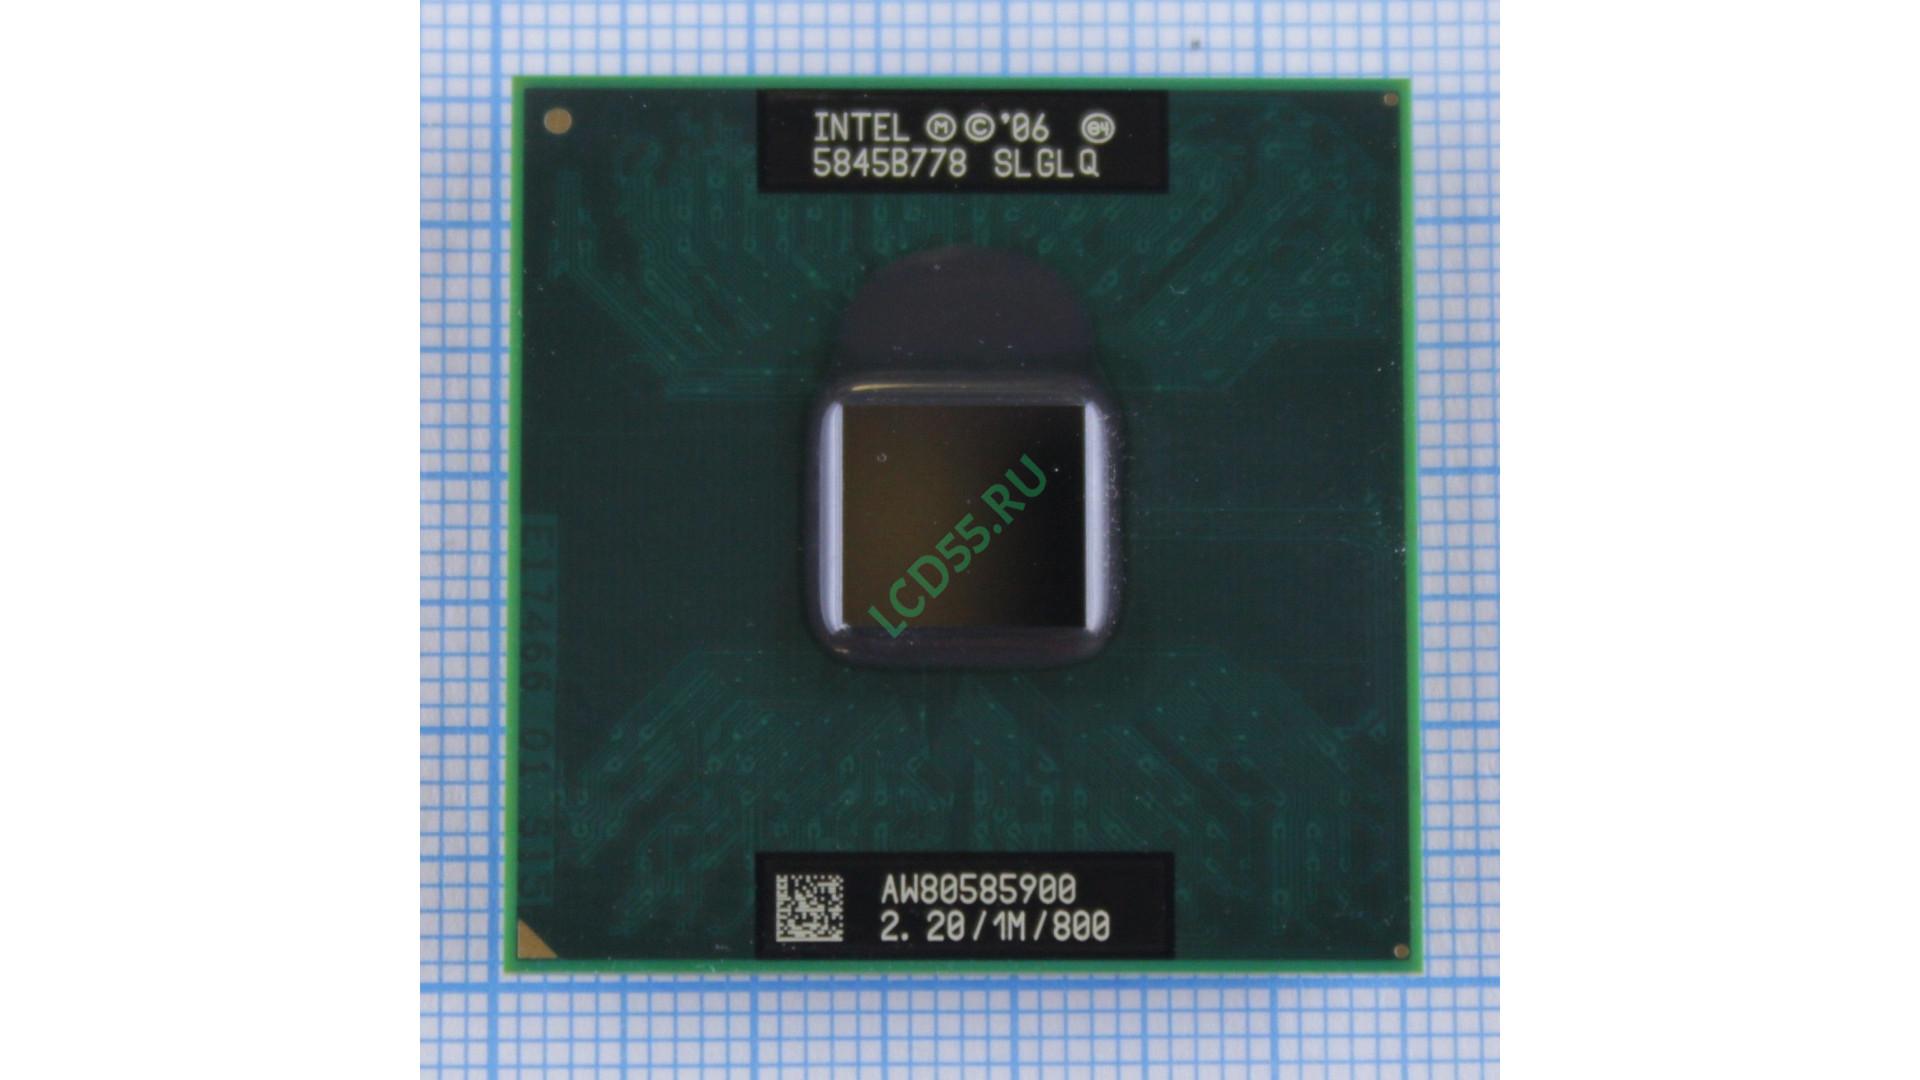 Intel Celeron 900 SLGLQ